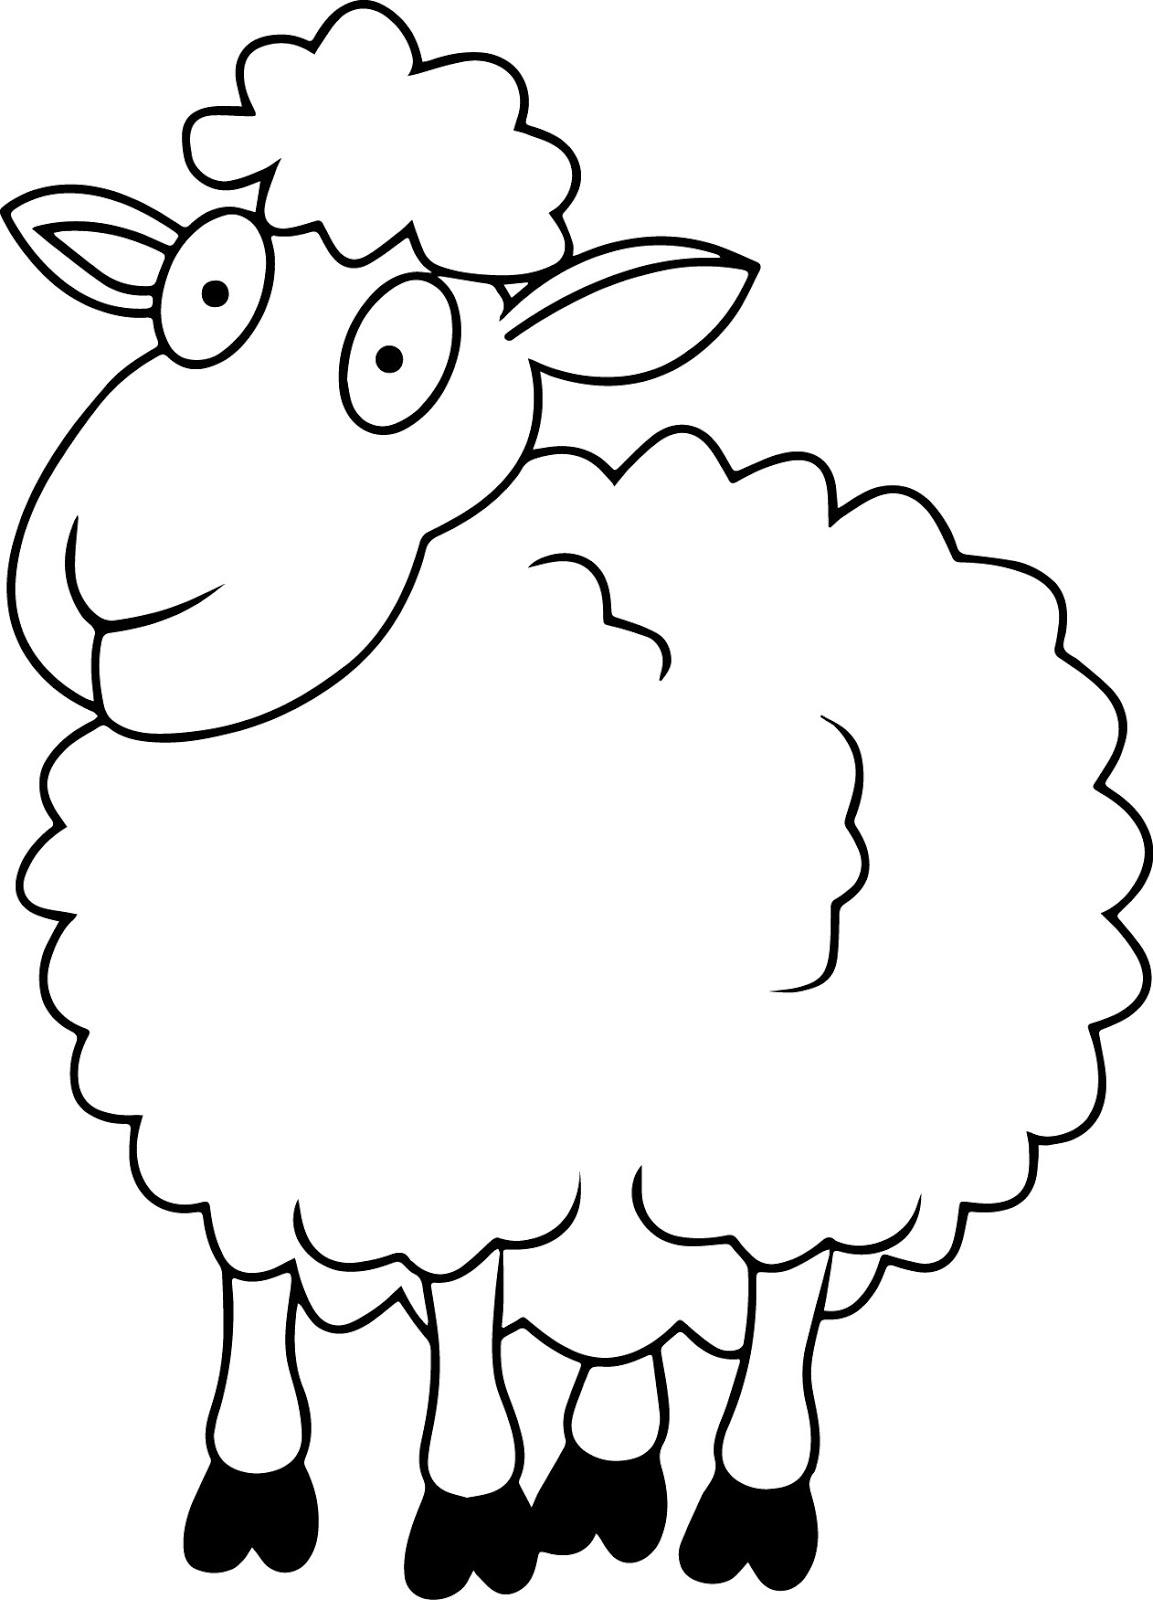 Simple Lamb Drawing at GetDrawings com   Free for personal